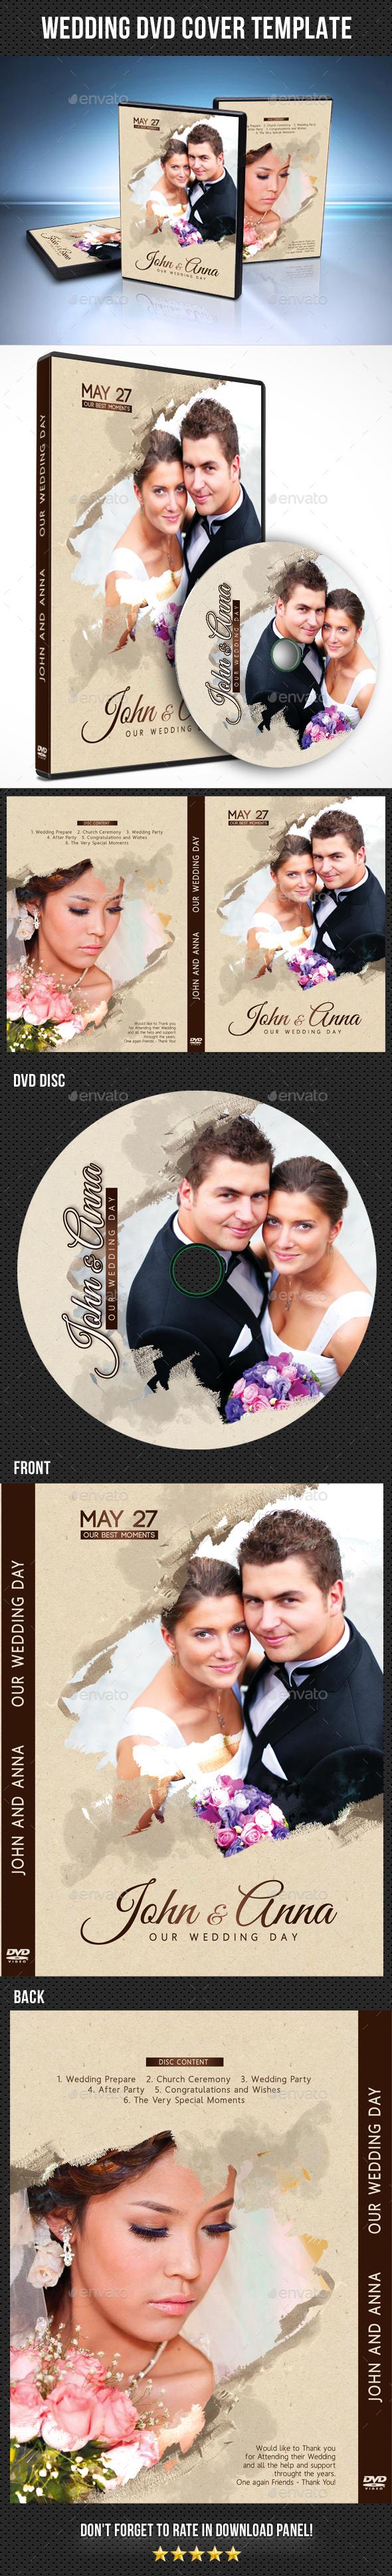 Wedding DVD Cover Template 18 - CD & DVD Artwork Print Templates